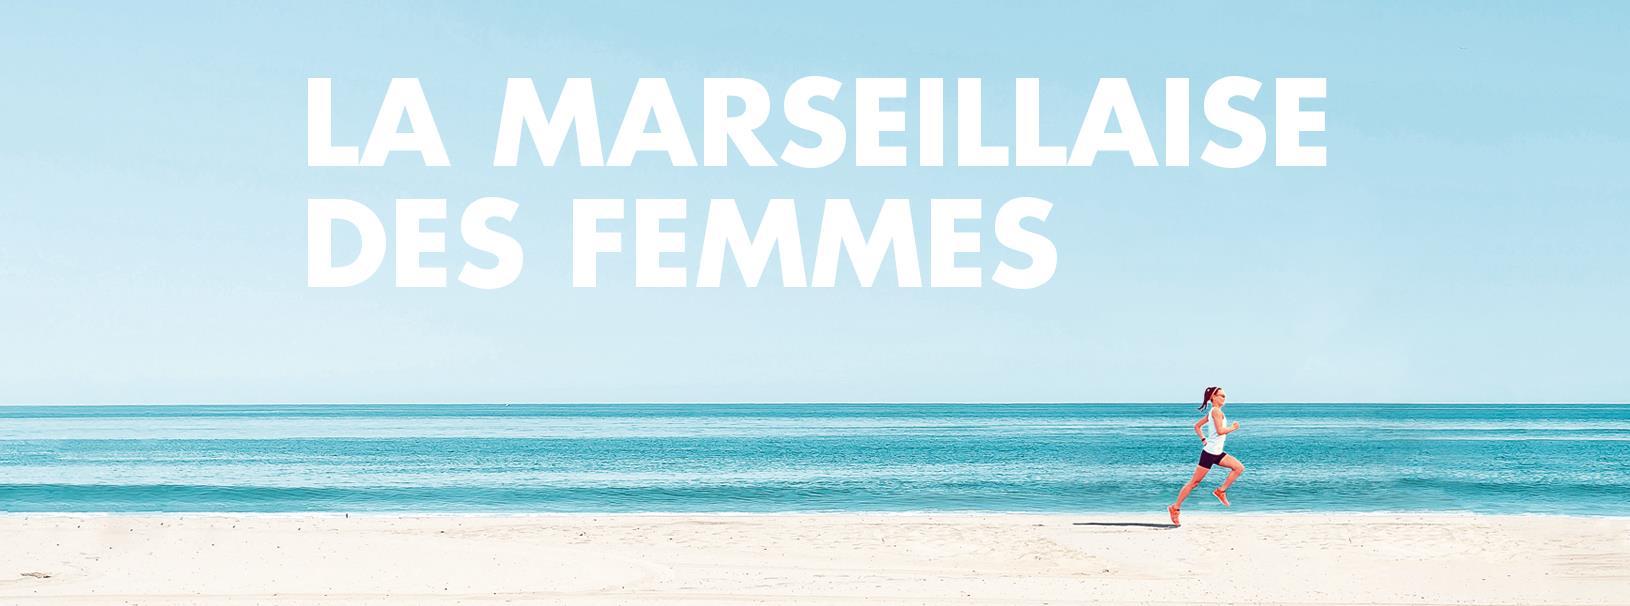 course marseillaise des femmes marseille